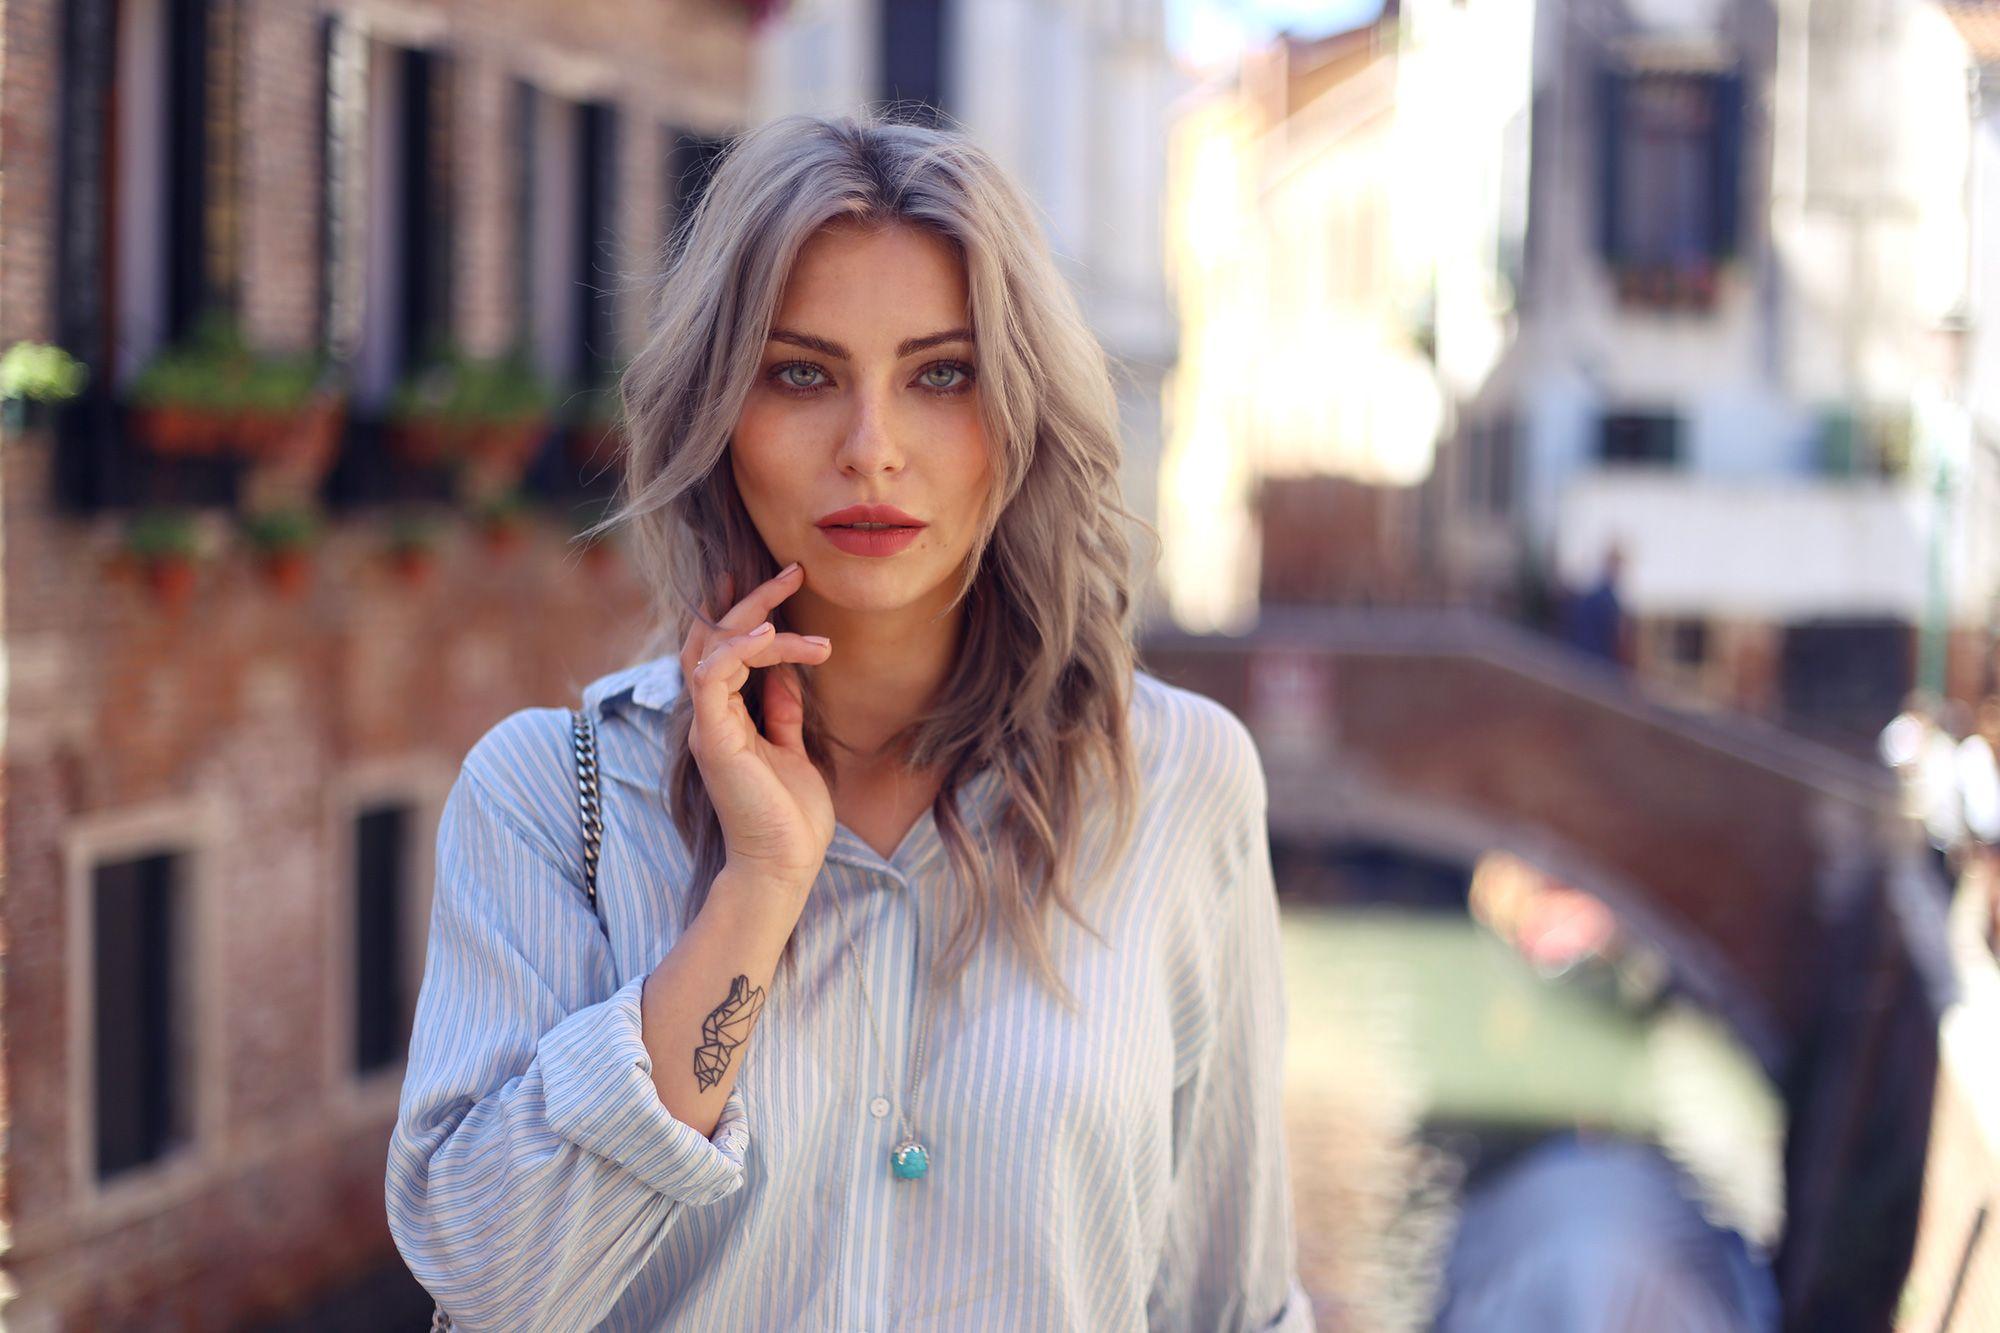 Venedig-casual-outfit-11